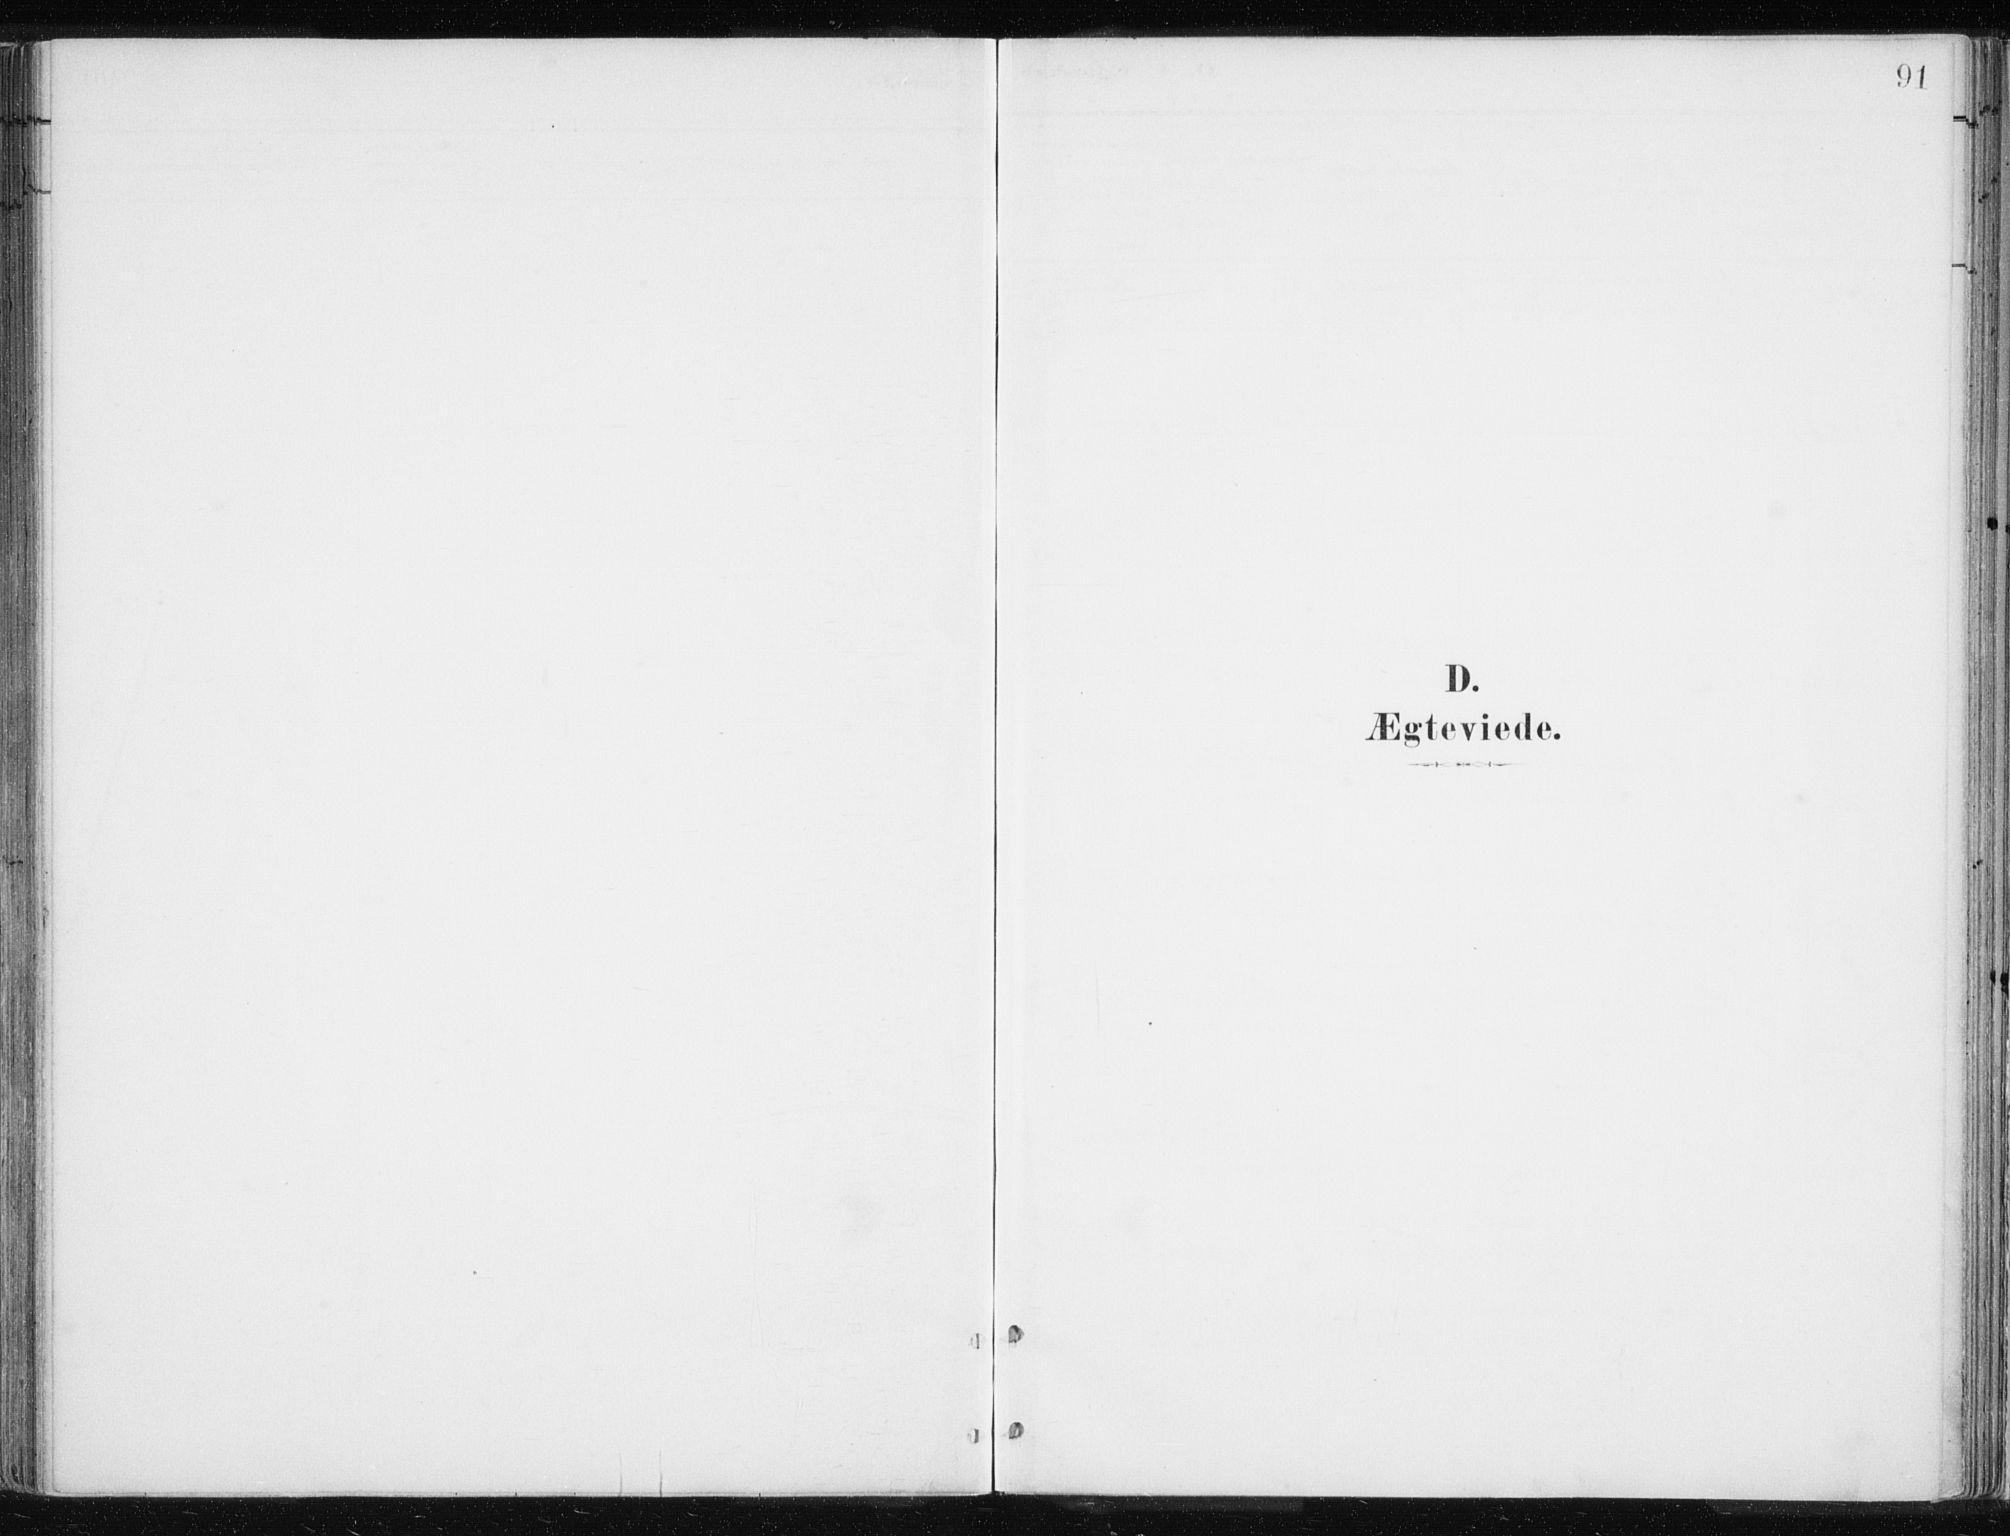 SATØ, Lyngen sokneprestembete, Ministerialbok nr. 10, 1883-1904, s. 91